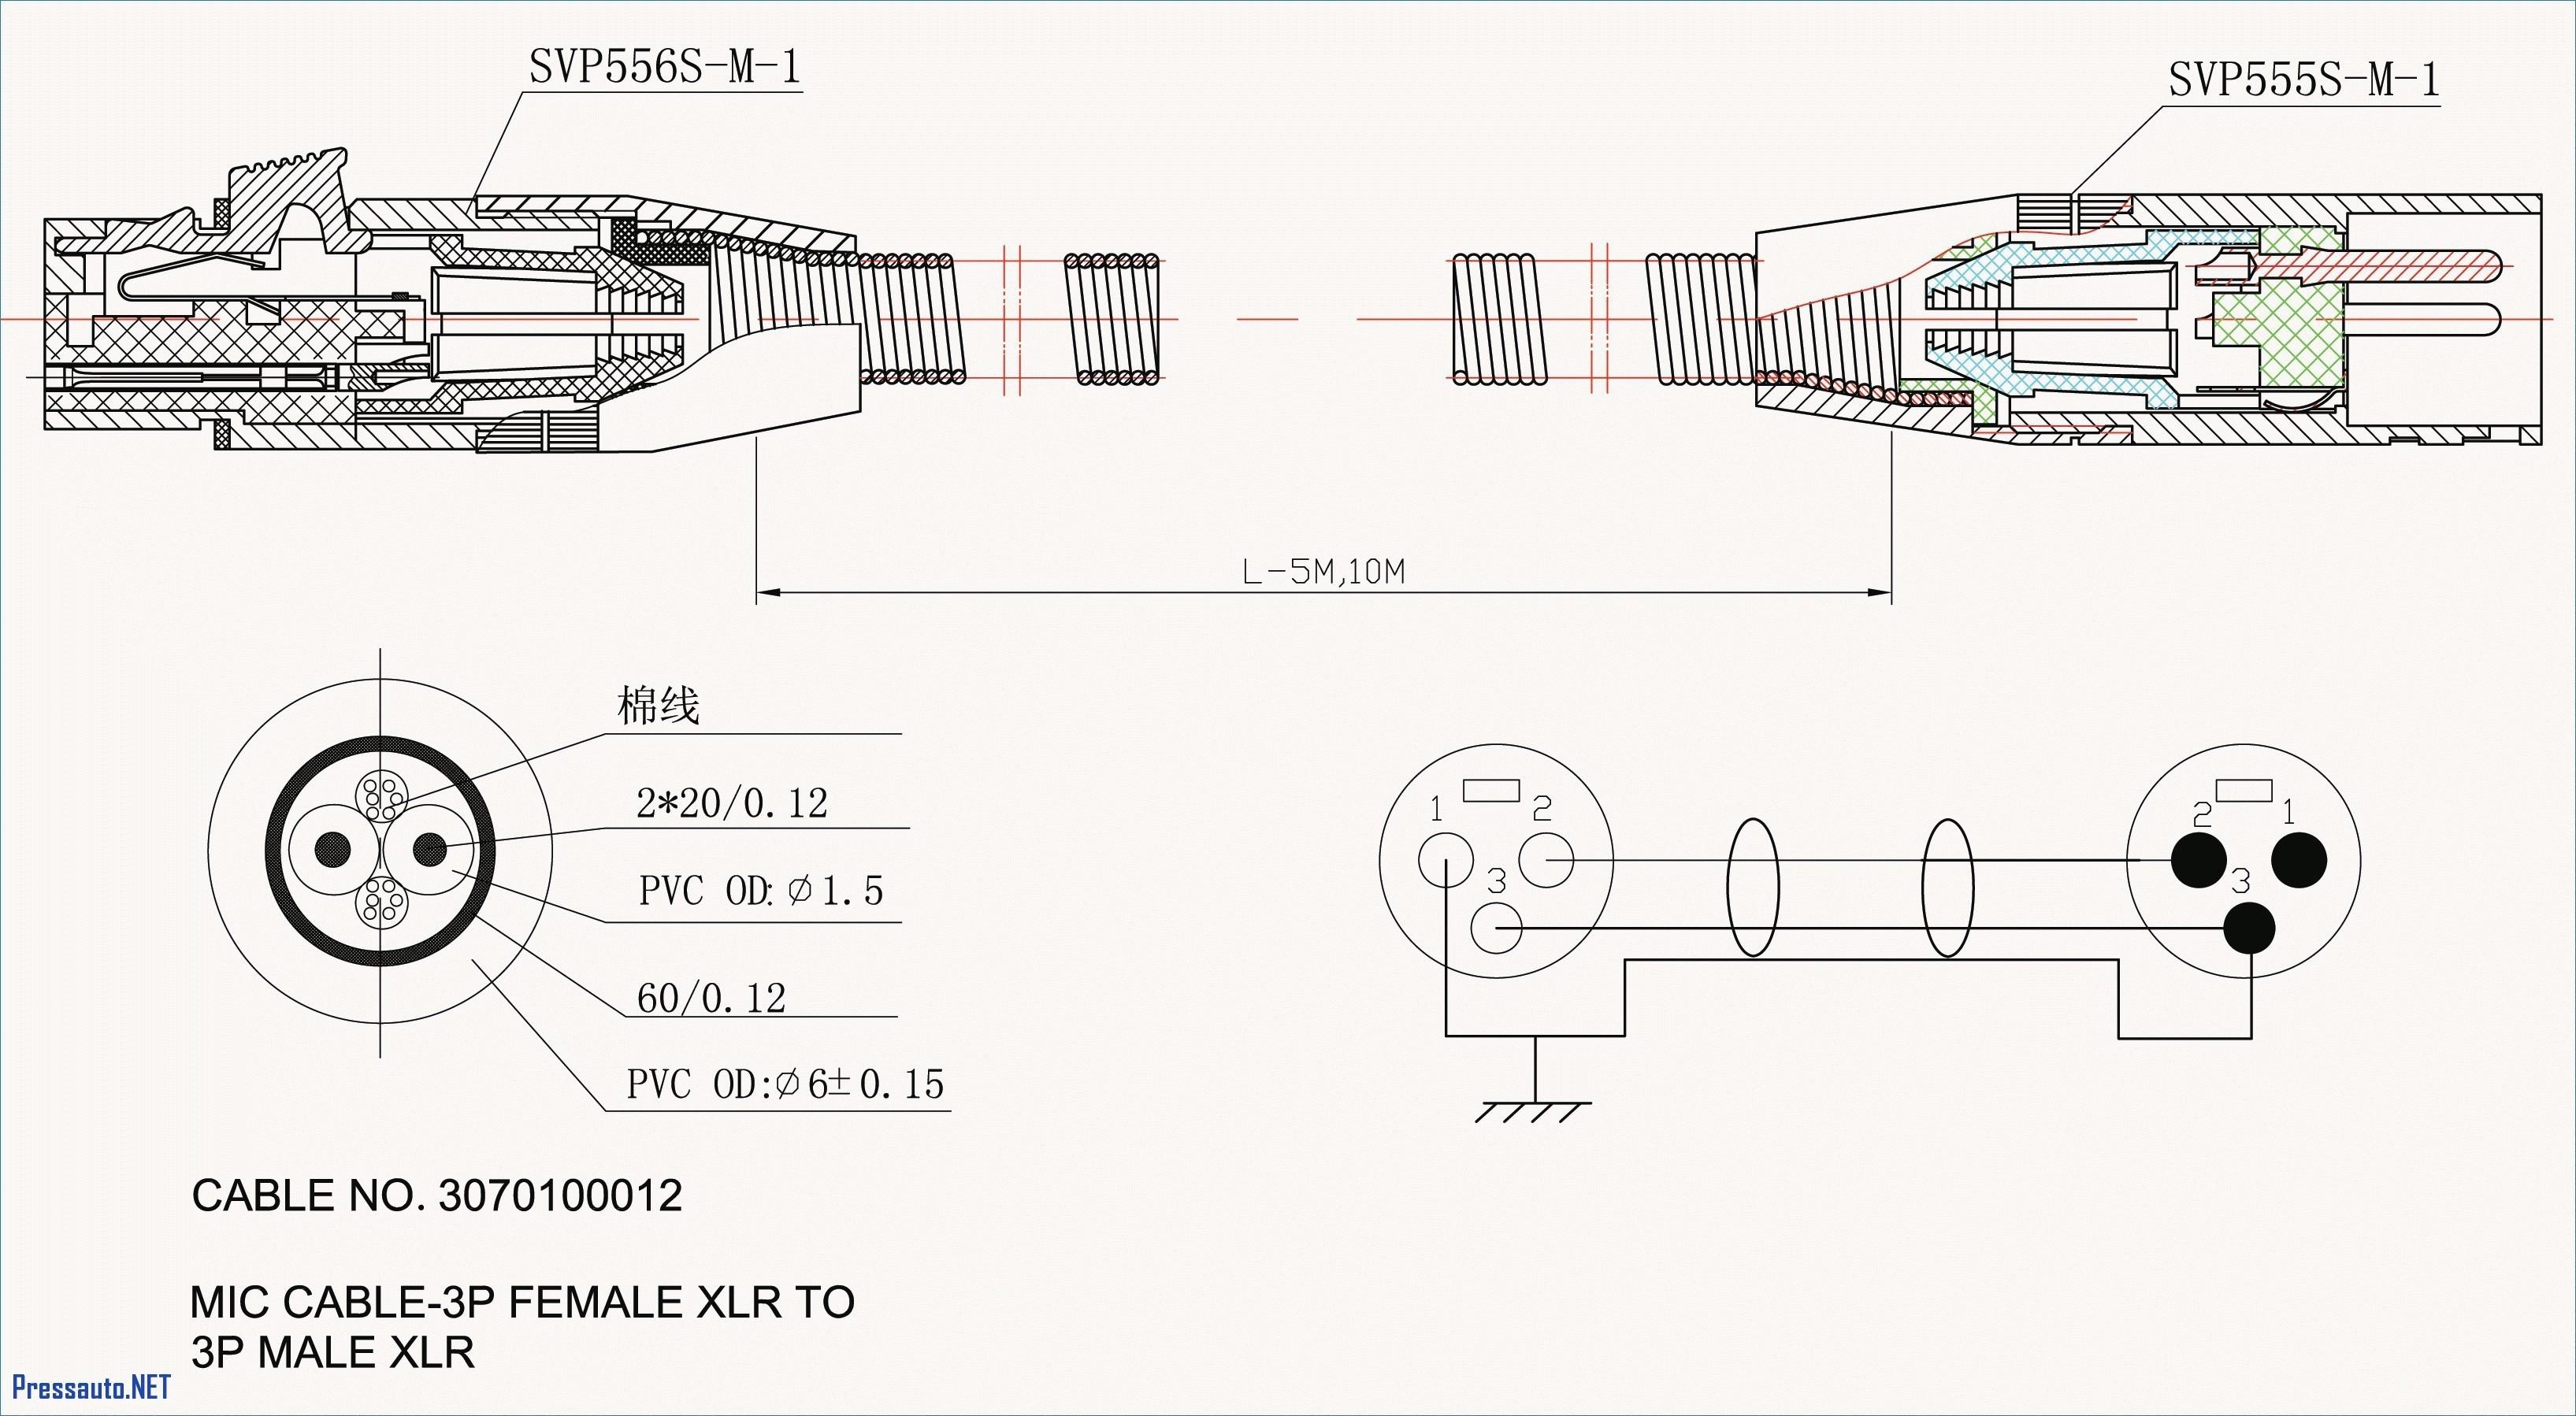 2006 toyota Corolla Engine Diagram Alternator Wiring Diagram toyota Pickup Fresh Corolla Wiring Diagram Of 2006 toyota Corolla Engine Diagram